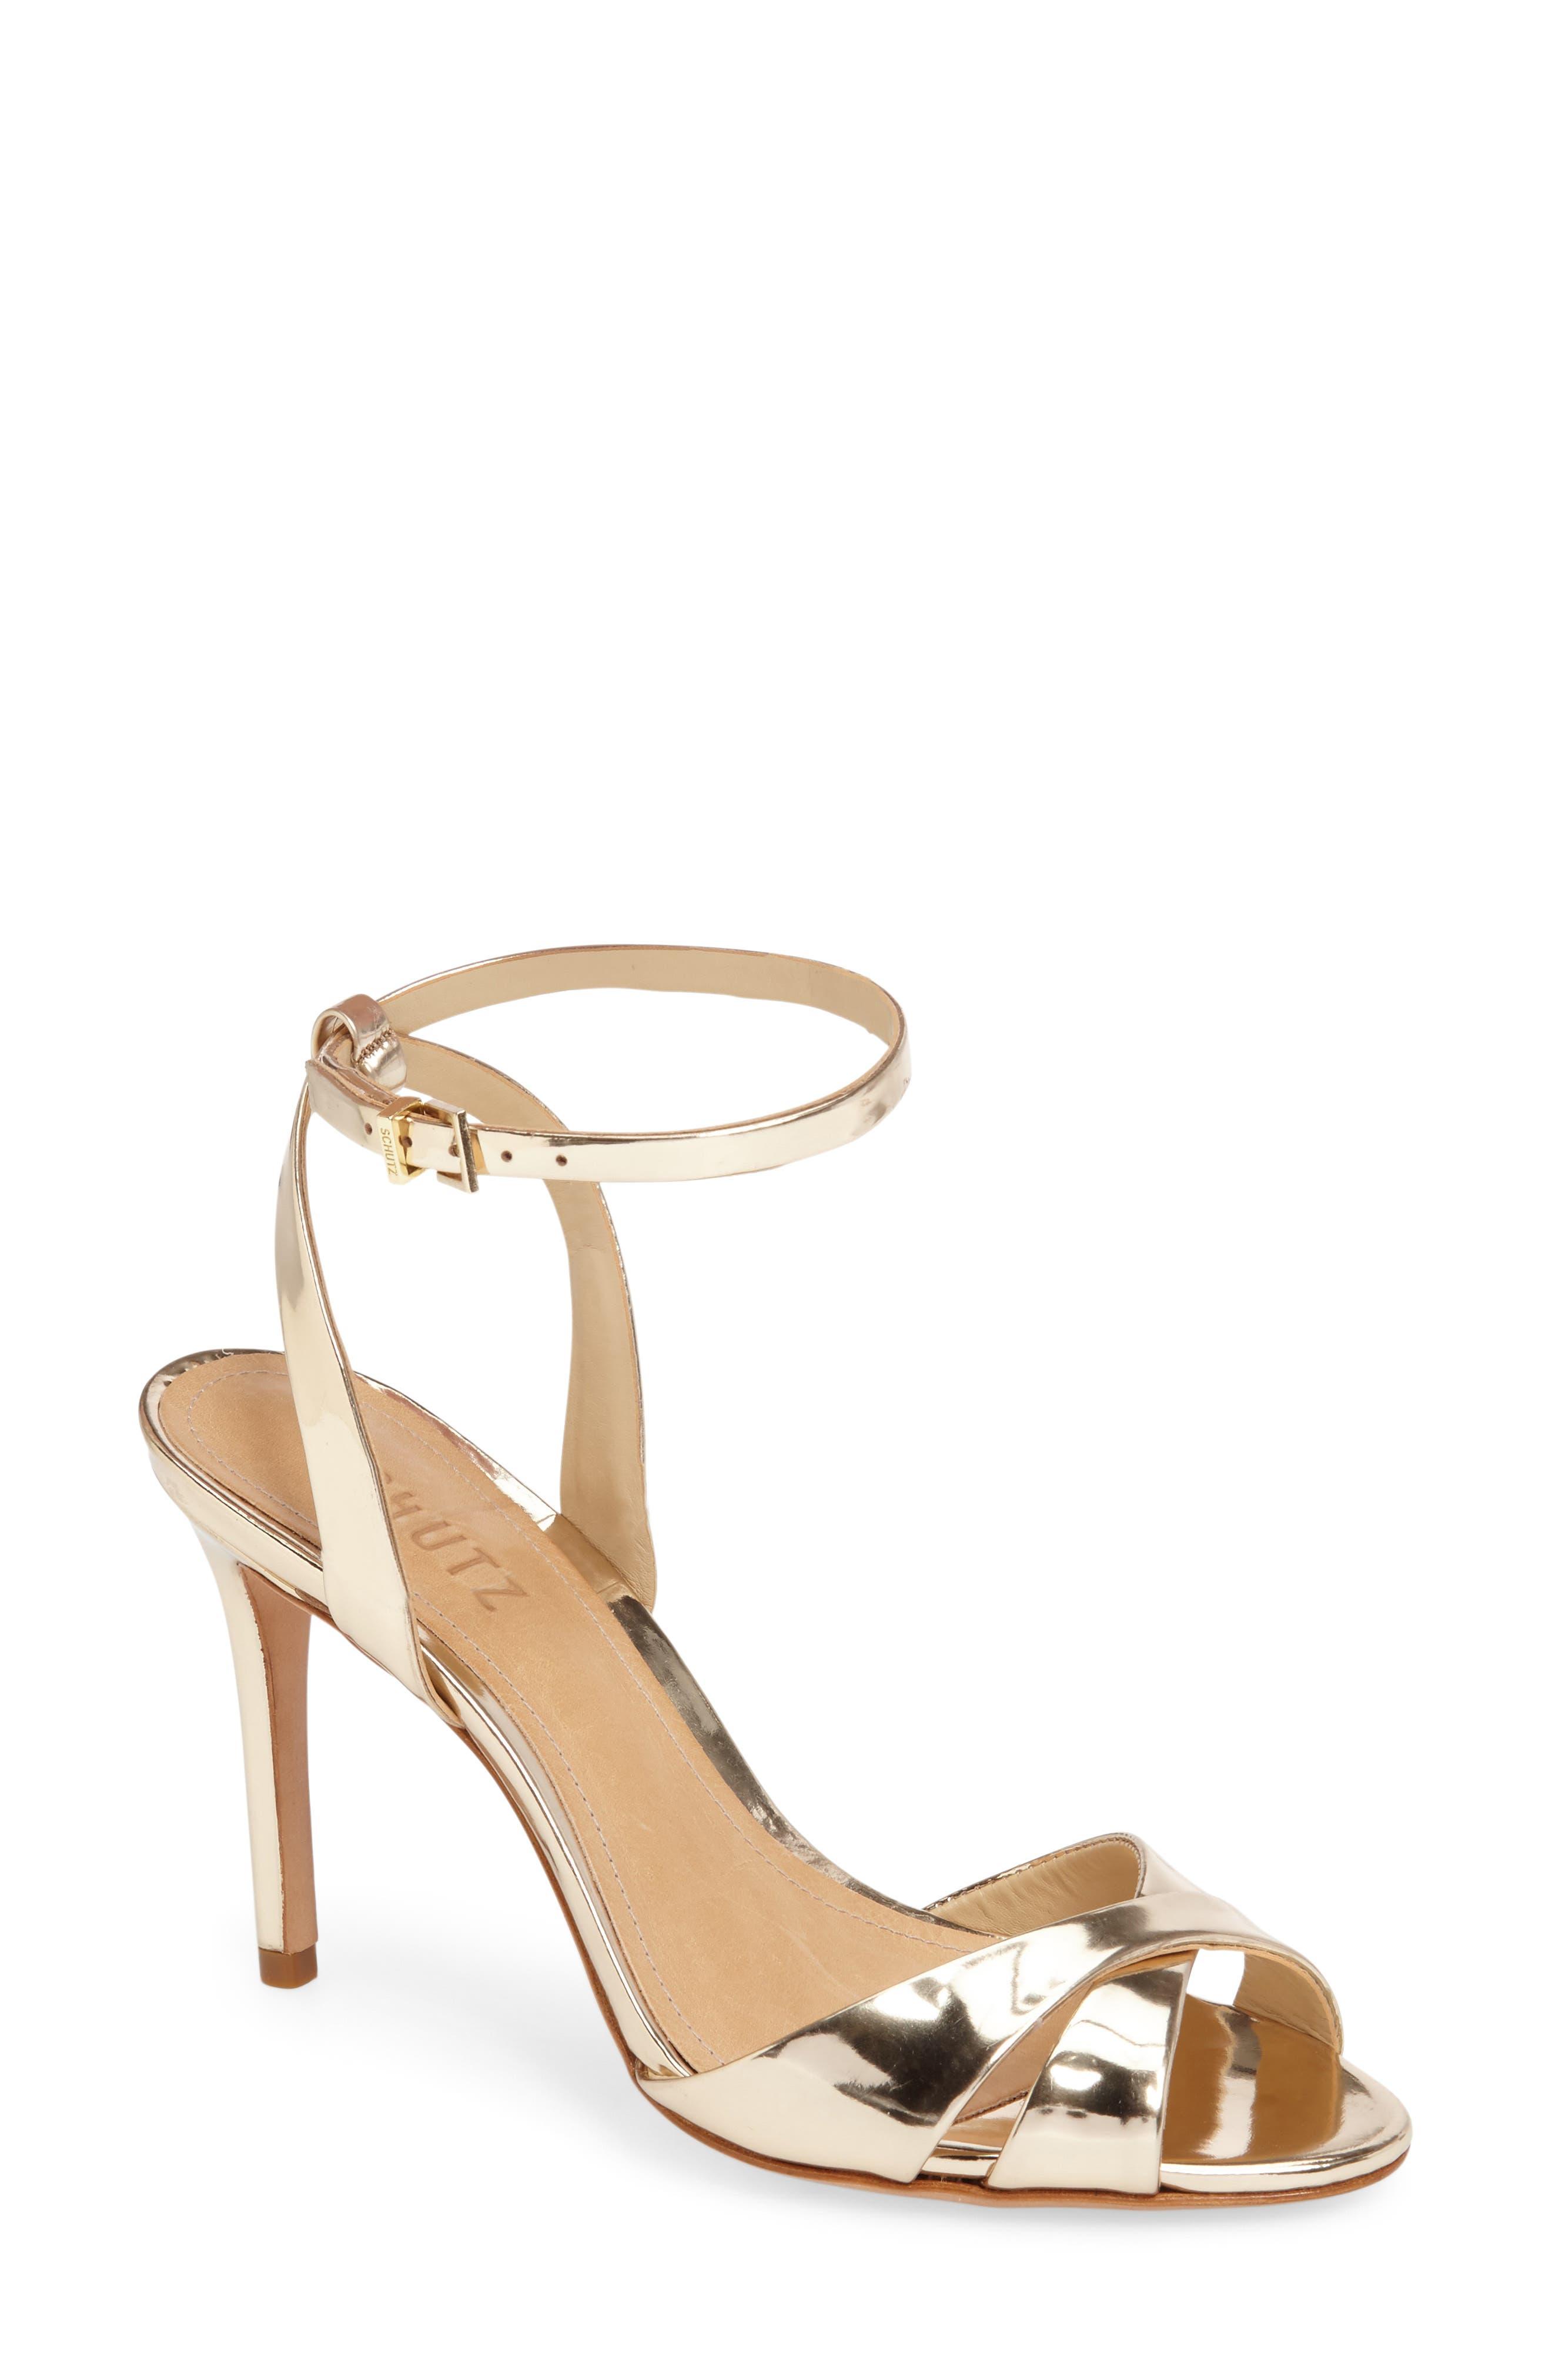 Olyvia Cross Toe Sandal,                         Main,                         color, 040